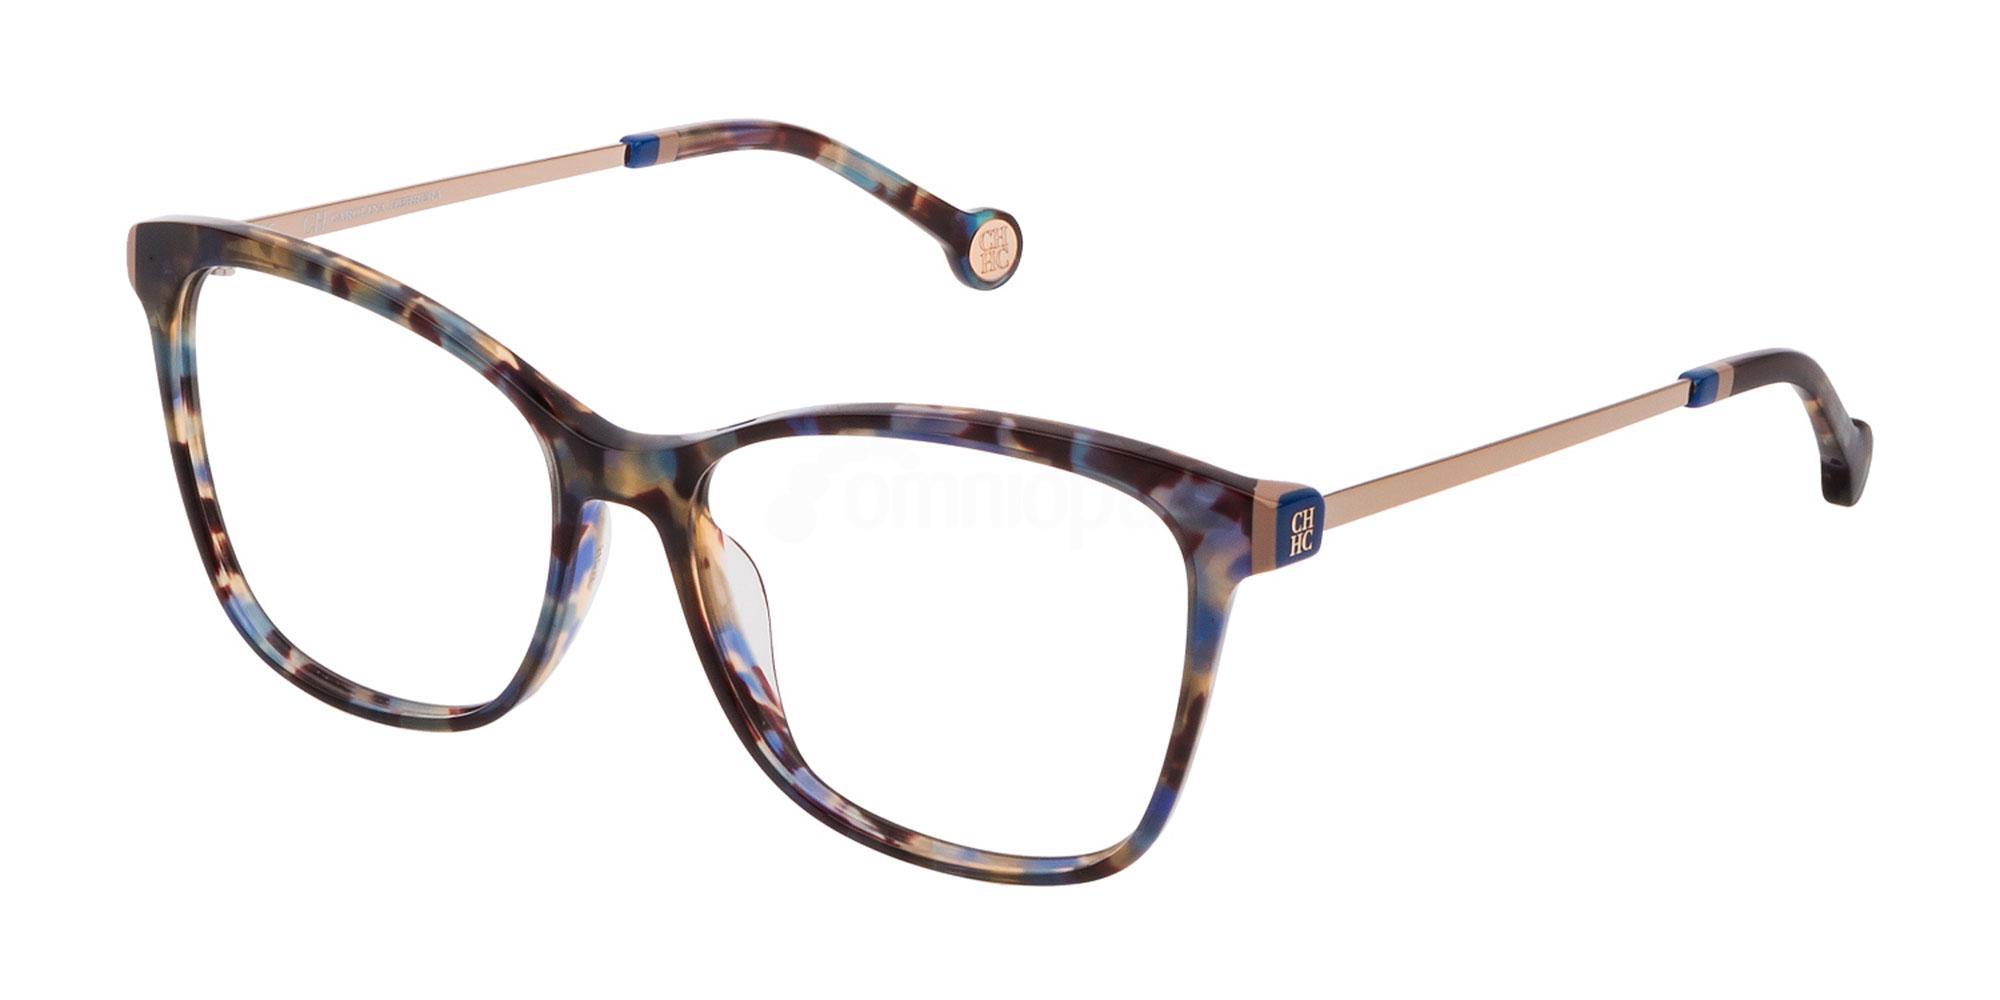 06DQ VHE818 Glasses, CH Carolina Herrera